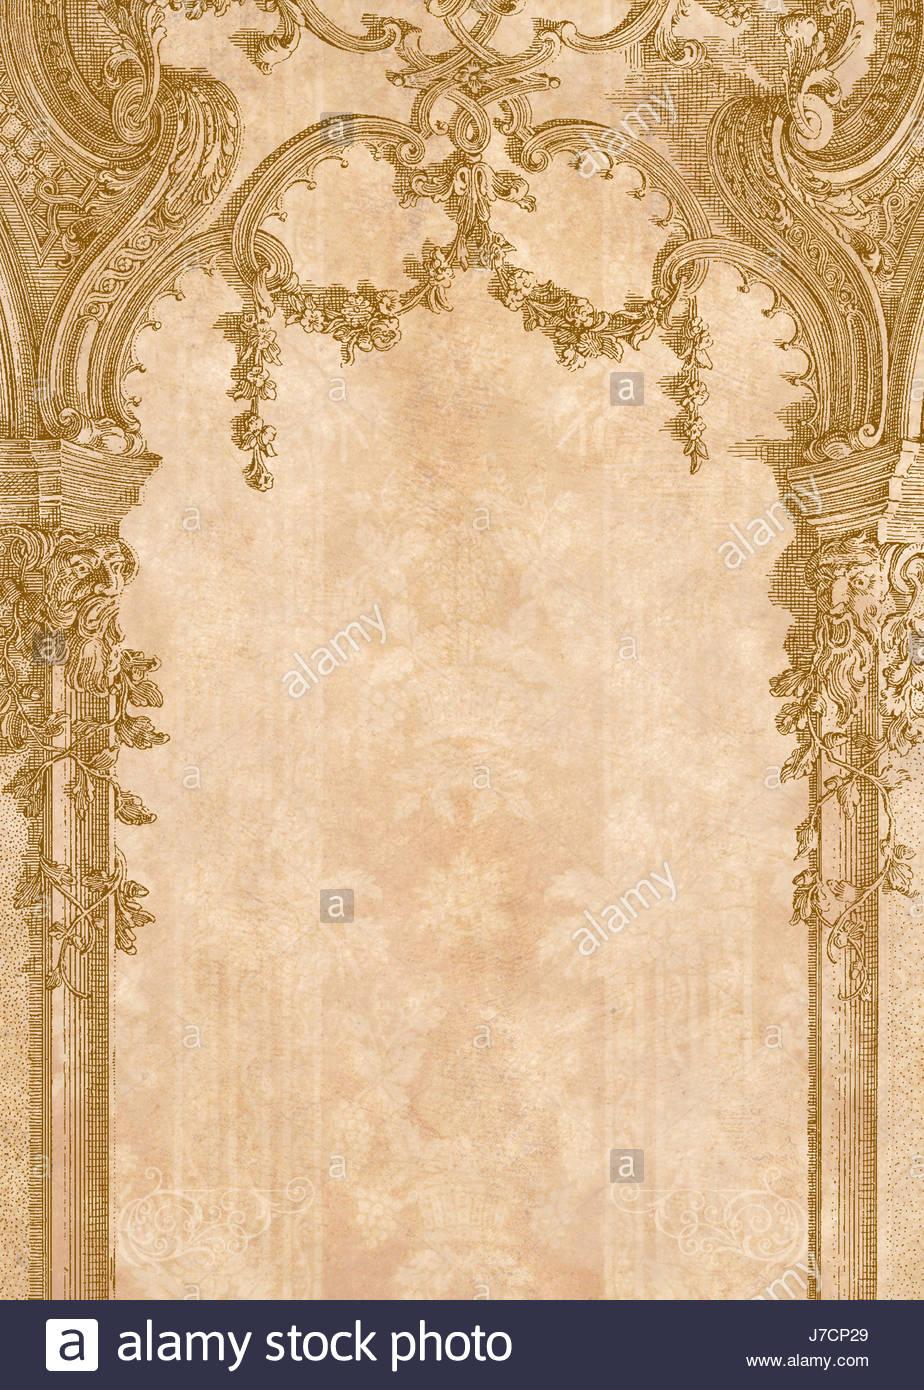 art antique column abstract document certificate backgrounds 924x1390